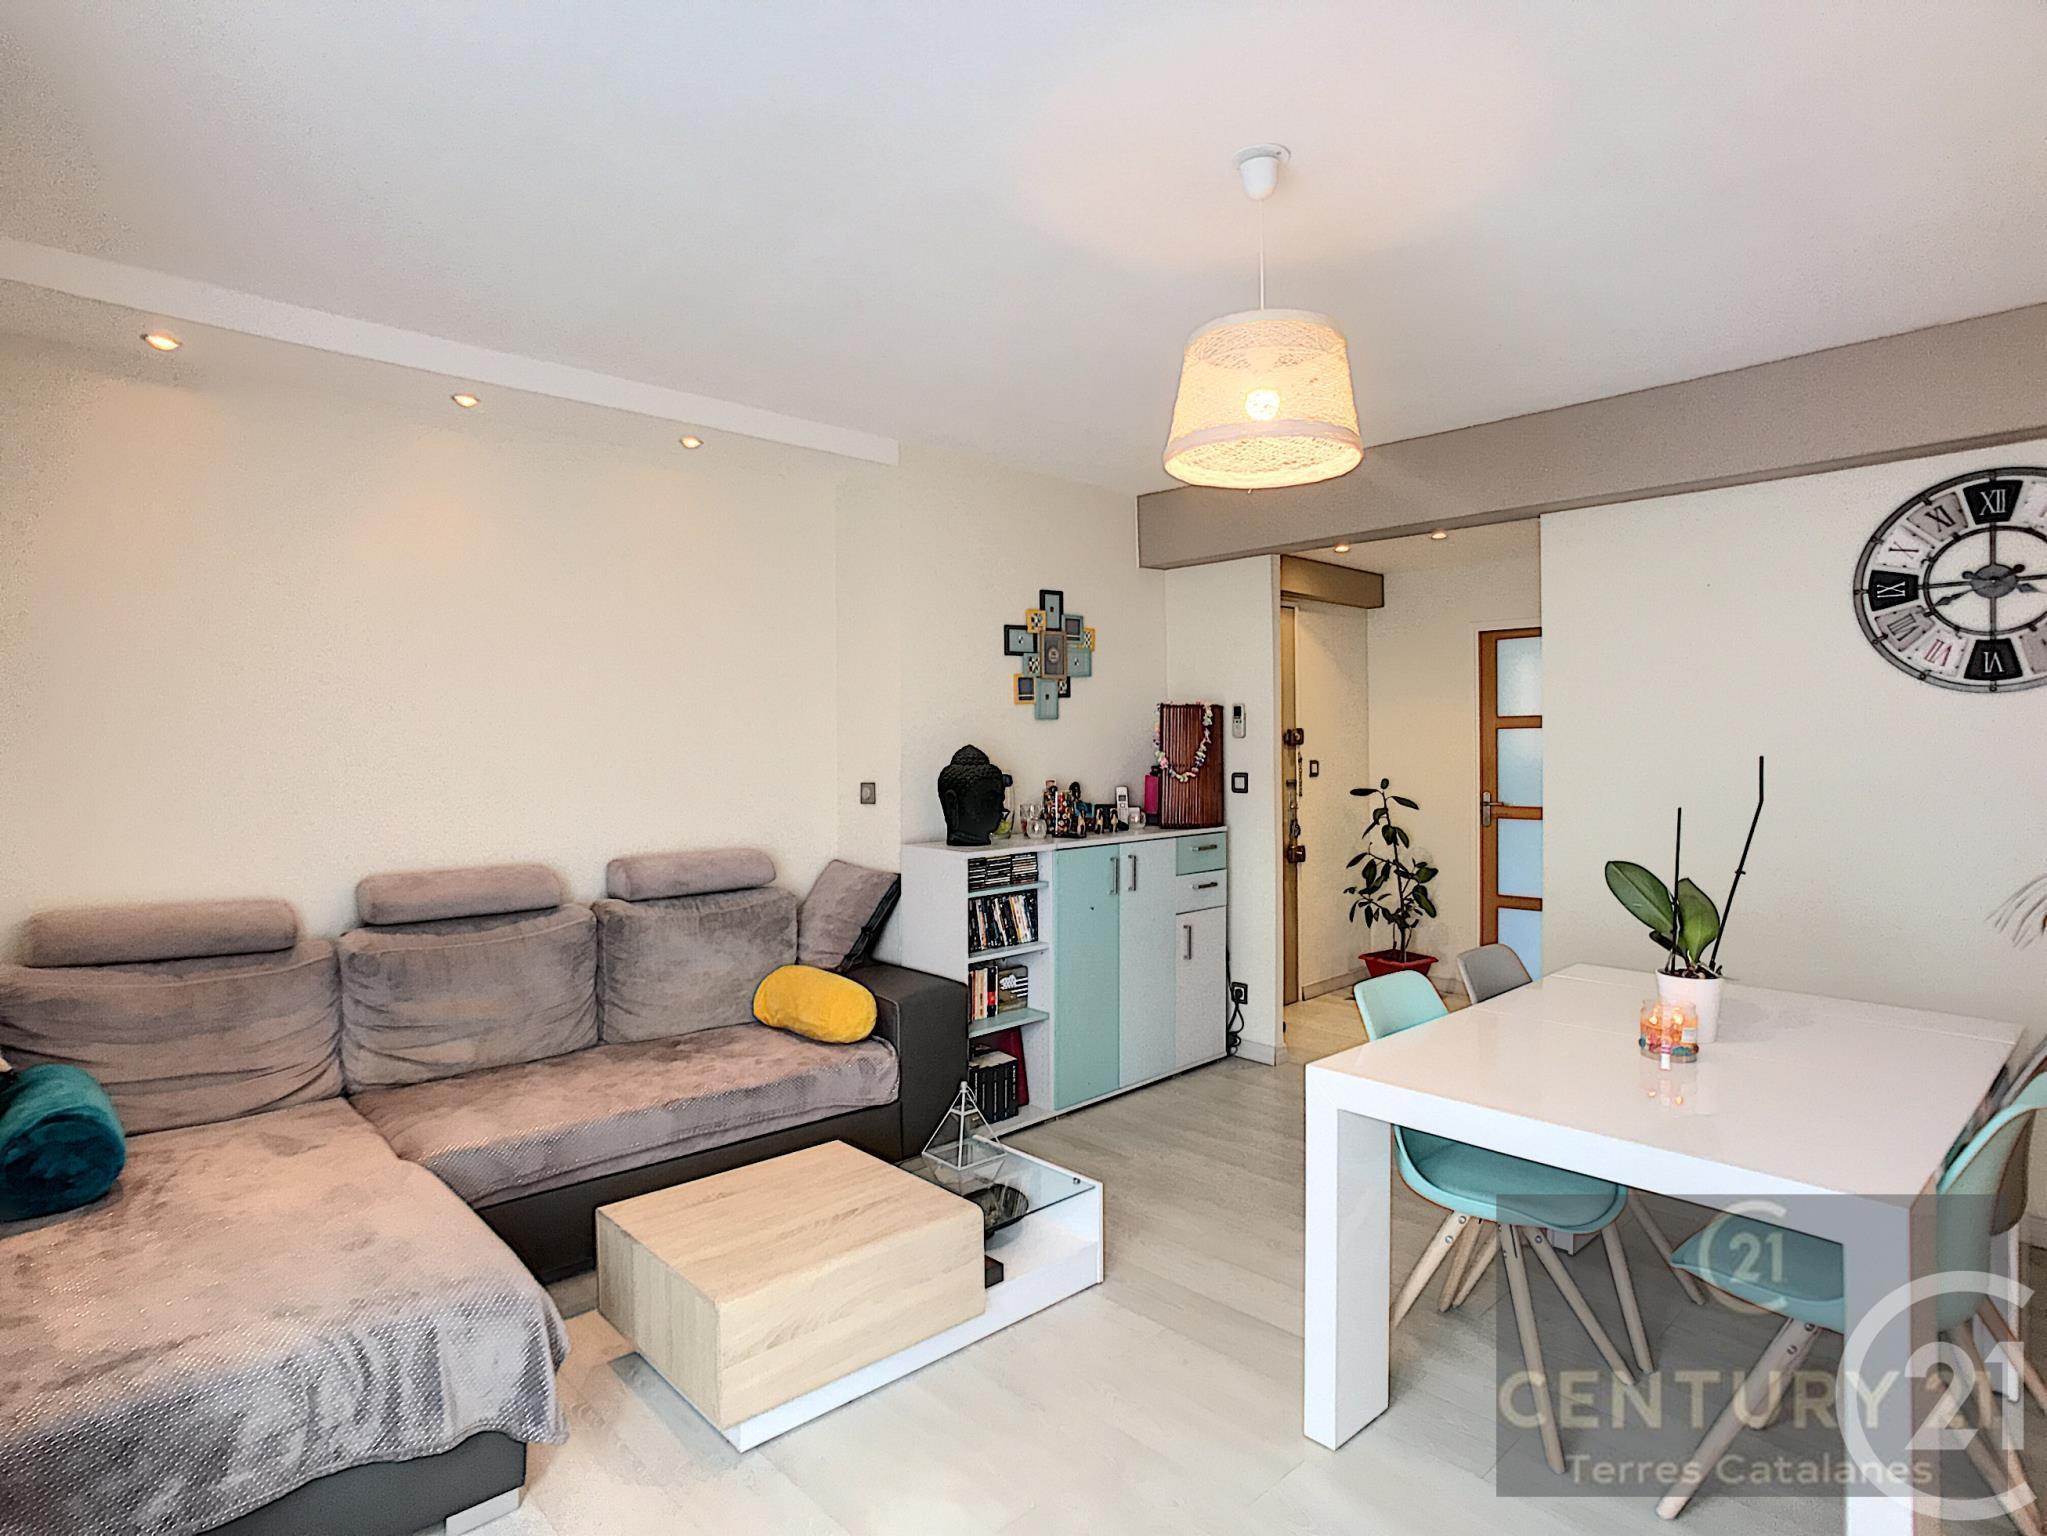 Appartement T3 A Vendre 3 Pieces 67 M2 Perpignan 66